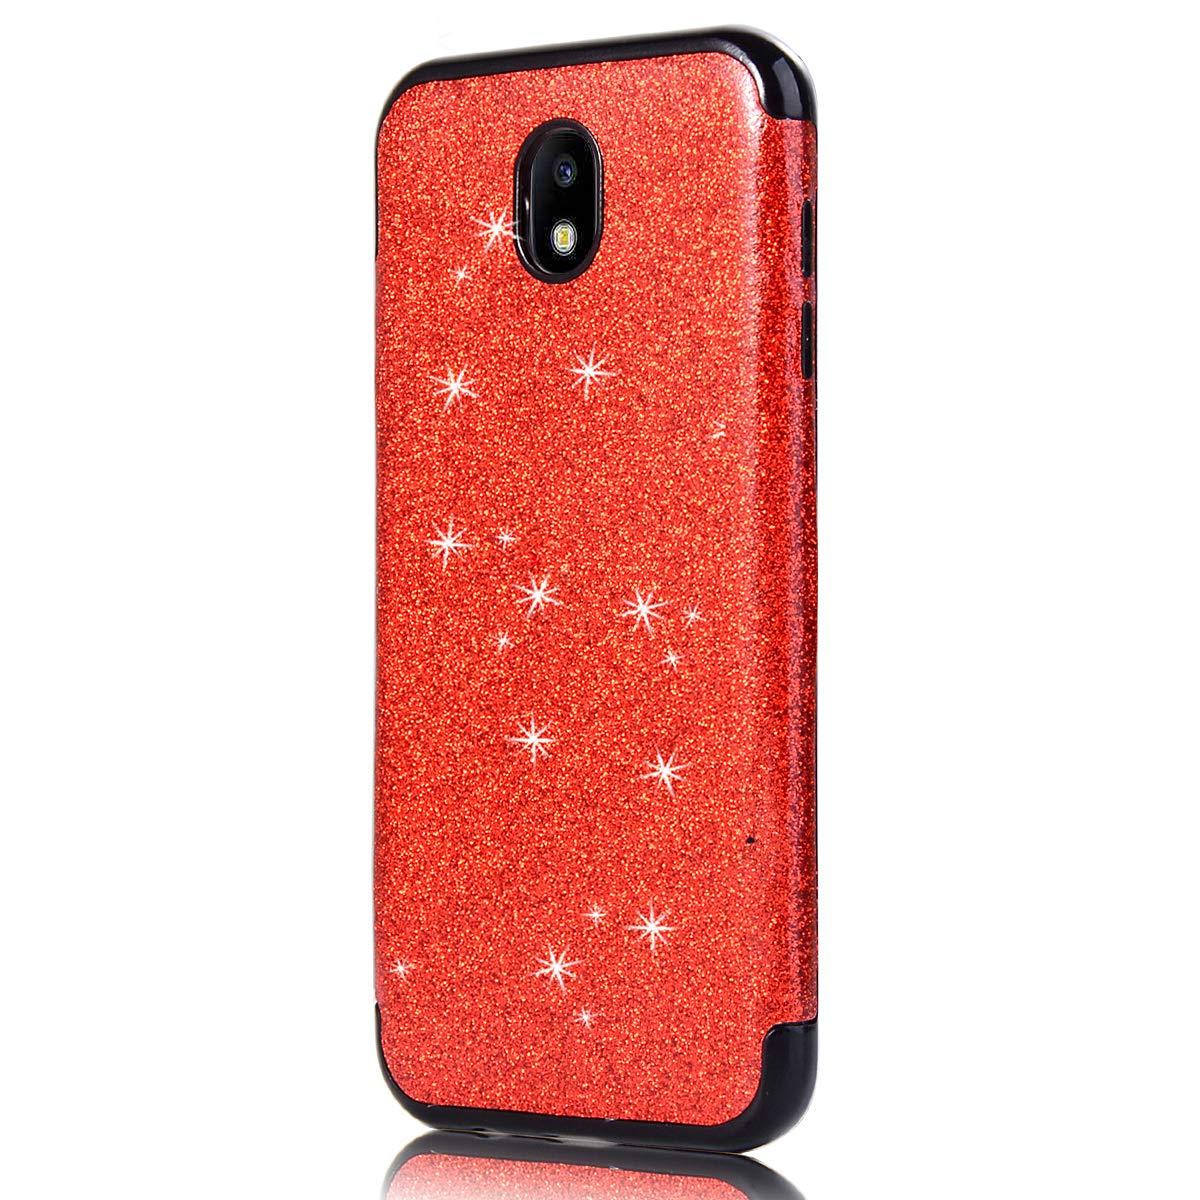 Felfy Okssud Coque Samsung Galaxy J7 J730, Galaxy J7 2017 Coque Luxe Glitter Paillette Ultra Mince Lé ger Silicone TPU Soft Gel Souple Cover Etui de Té lé phone Coquille de Protection Shockproof É tui DYY2018002244#05